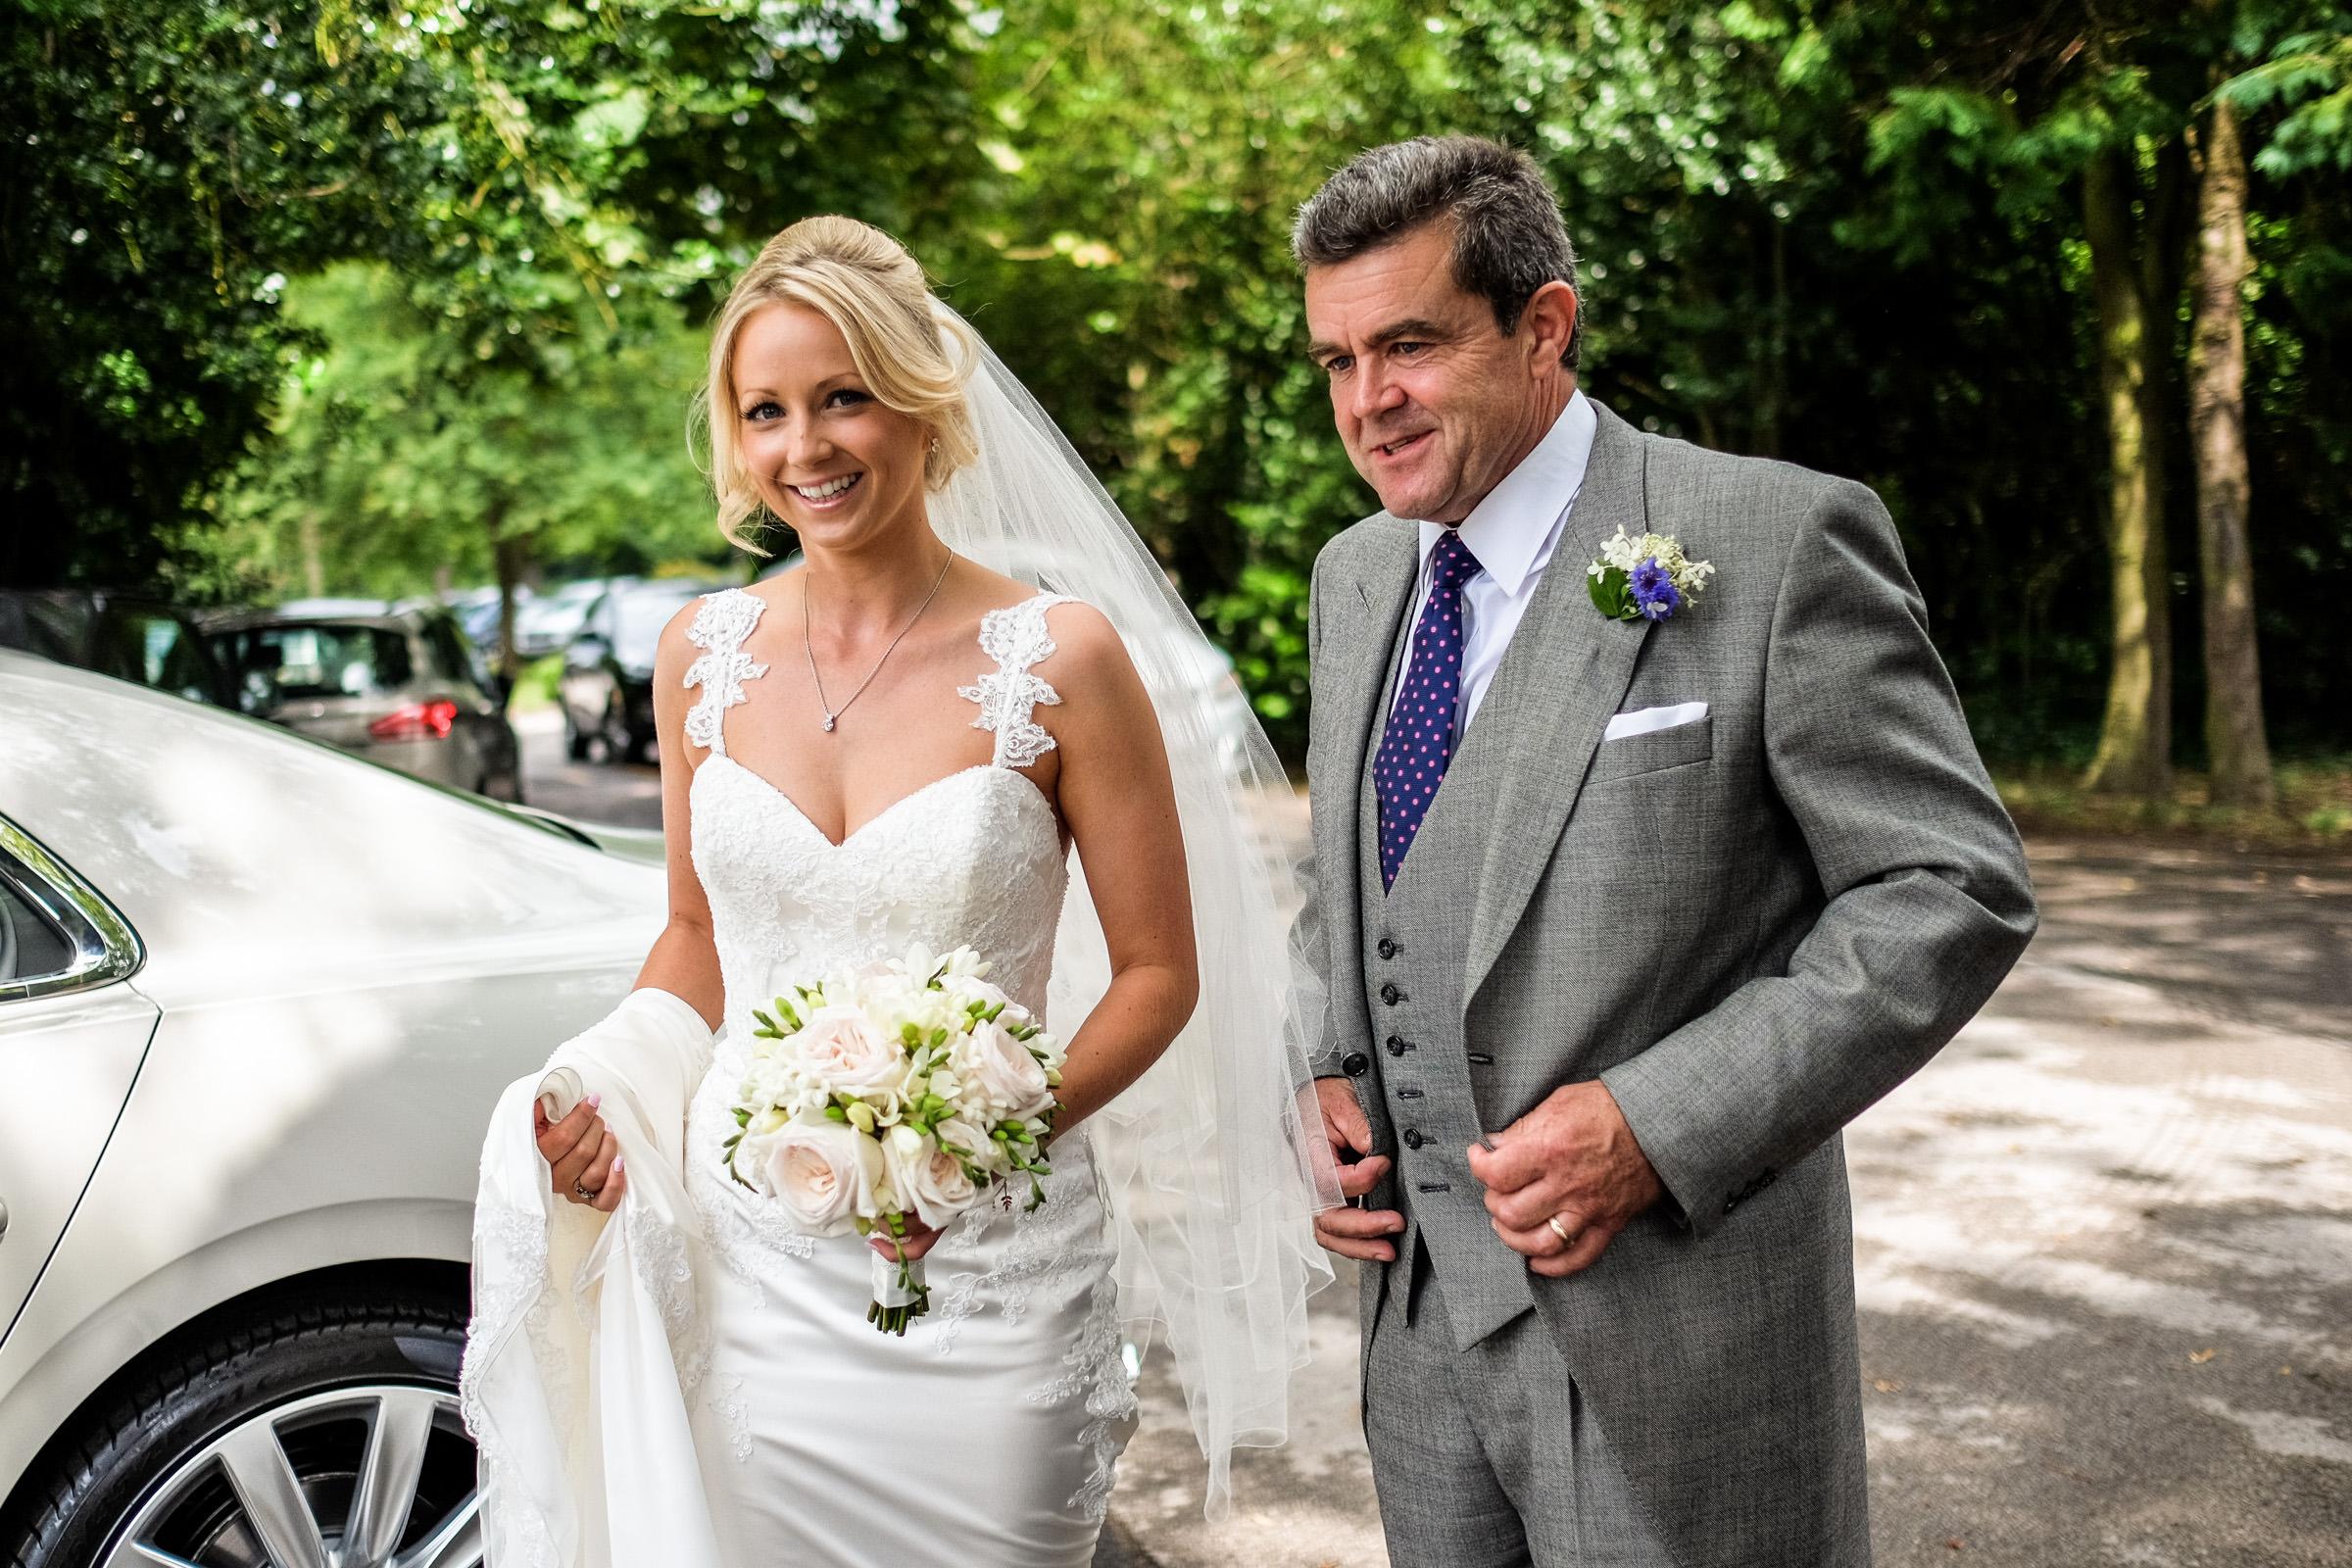 Wedding at Parkside School in Surrey 013.jpg